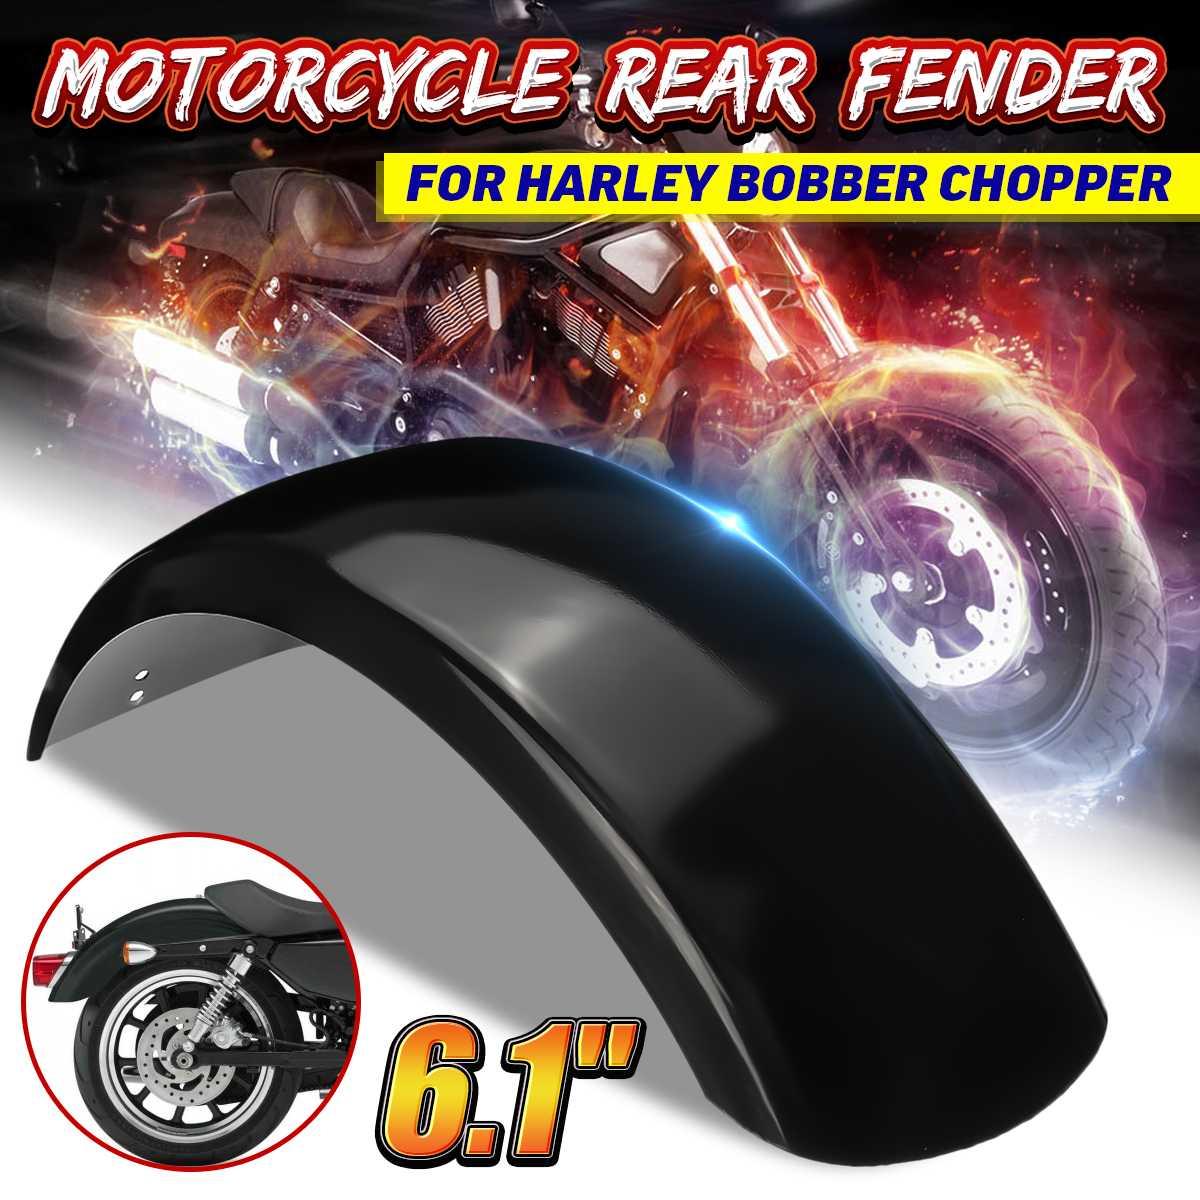 Protector de guardabarros trasero para motocicleta de 6,1 pulgadas, guardabarros de acero inoxidable para Harley Bobber Chopper